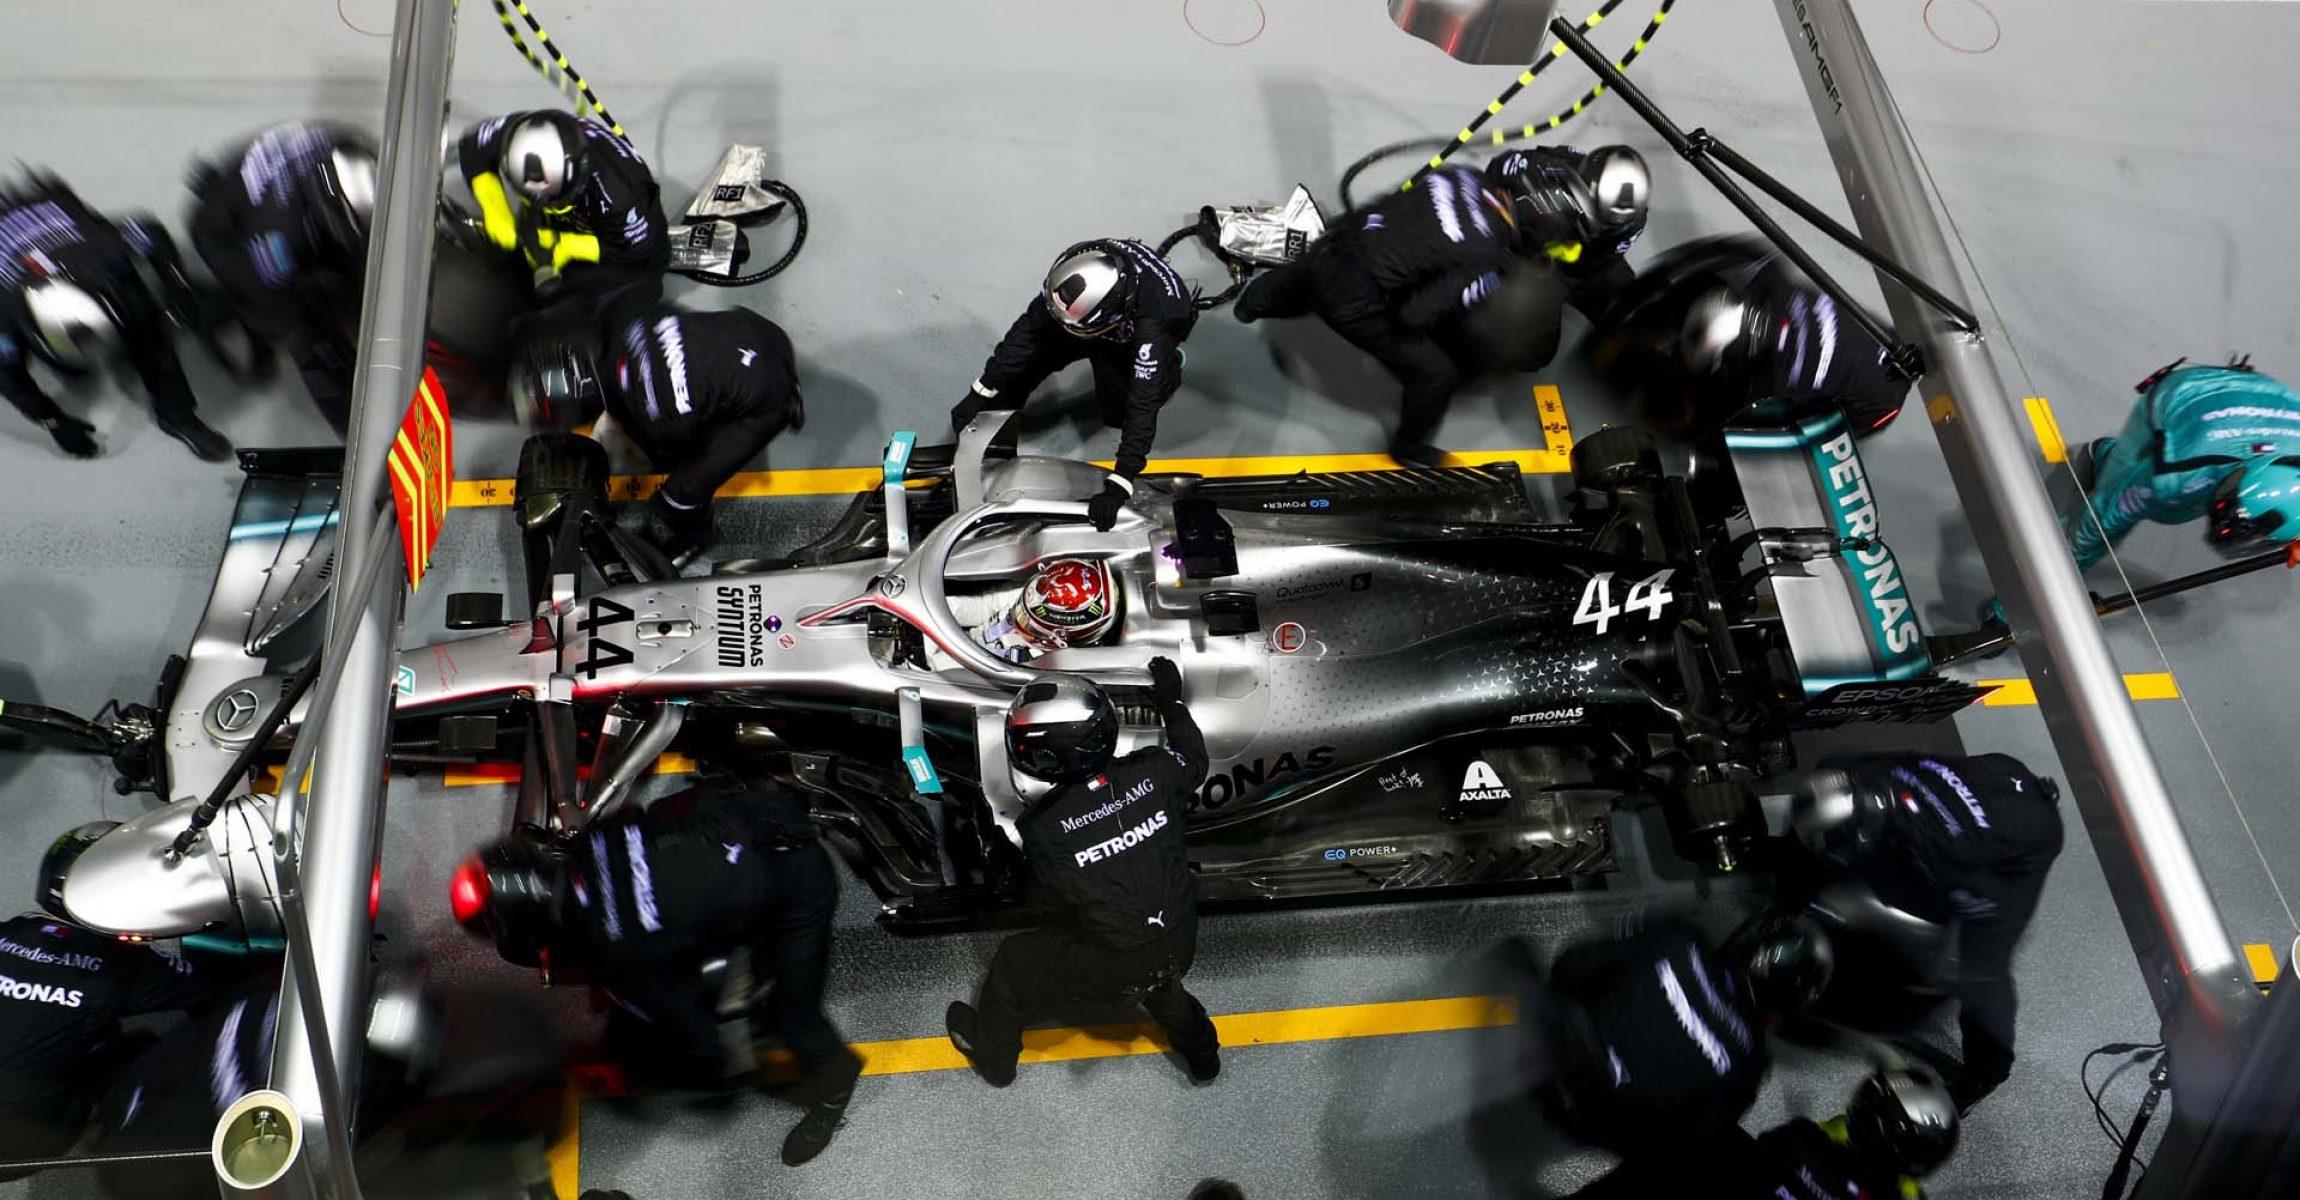 SINGAPORE STREET CIRCUIT, SINGAPORE - SEPTEMBER 22: Lewis Hamilton, Mercedes AMG F1 W10 pit stop during the Singapore GP at Singapore Street Circuit on September 22, 2019 in Singapore Street Circuit, Singapore. (Photo by Sam Bloxham / LAT Images)